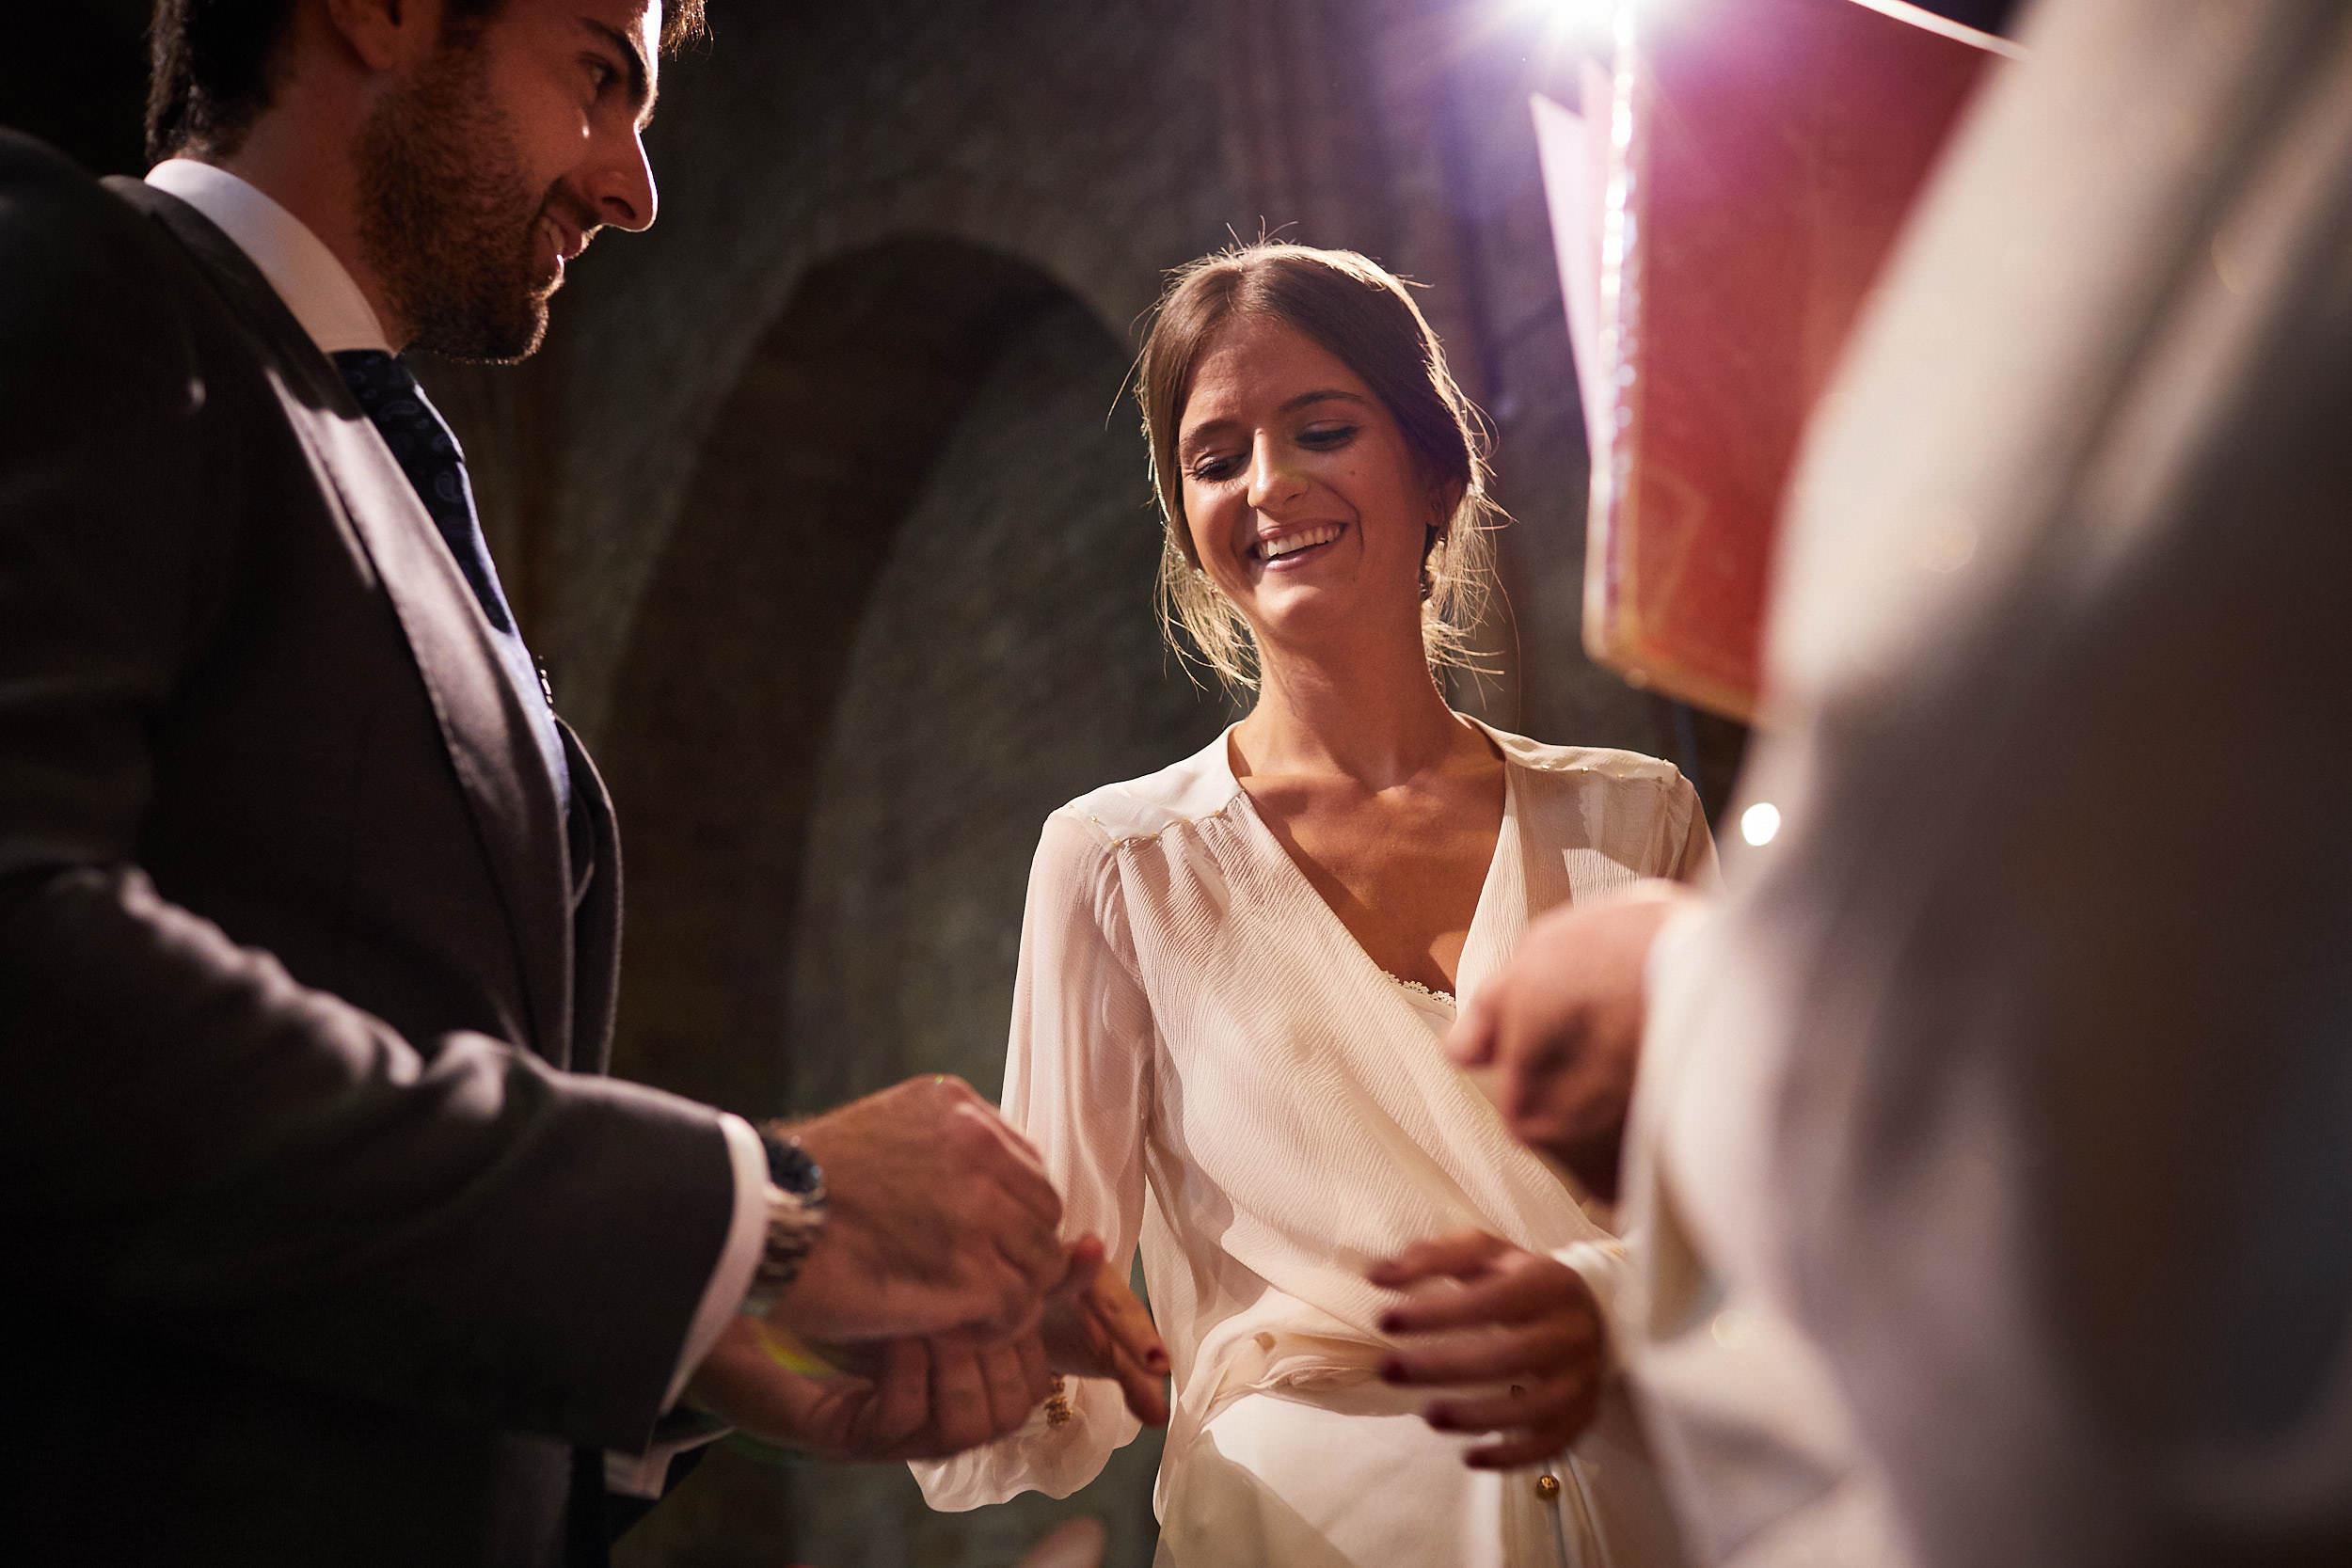 1809Basque_Country_Rioja_Wedding_Photographer_James_Sturcke_0035.jpg